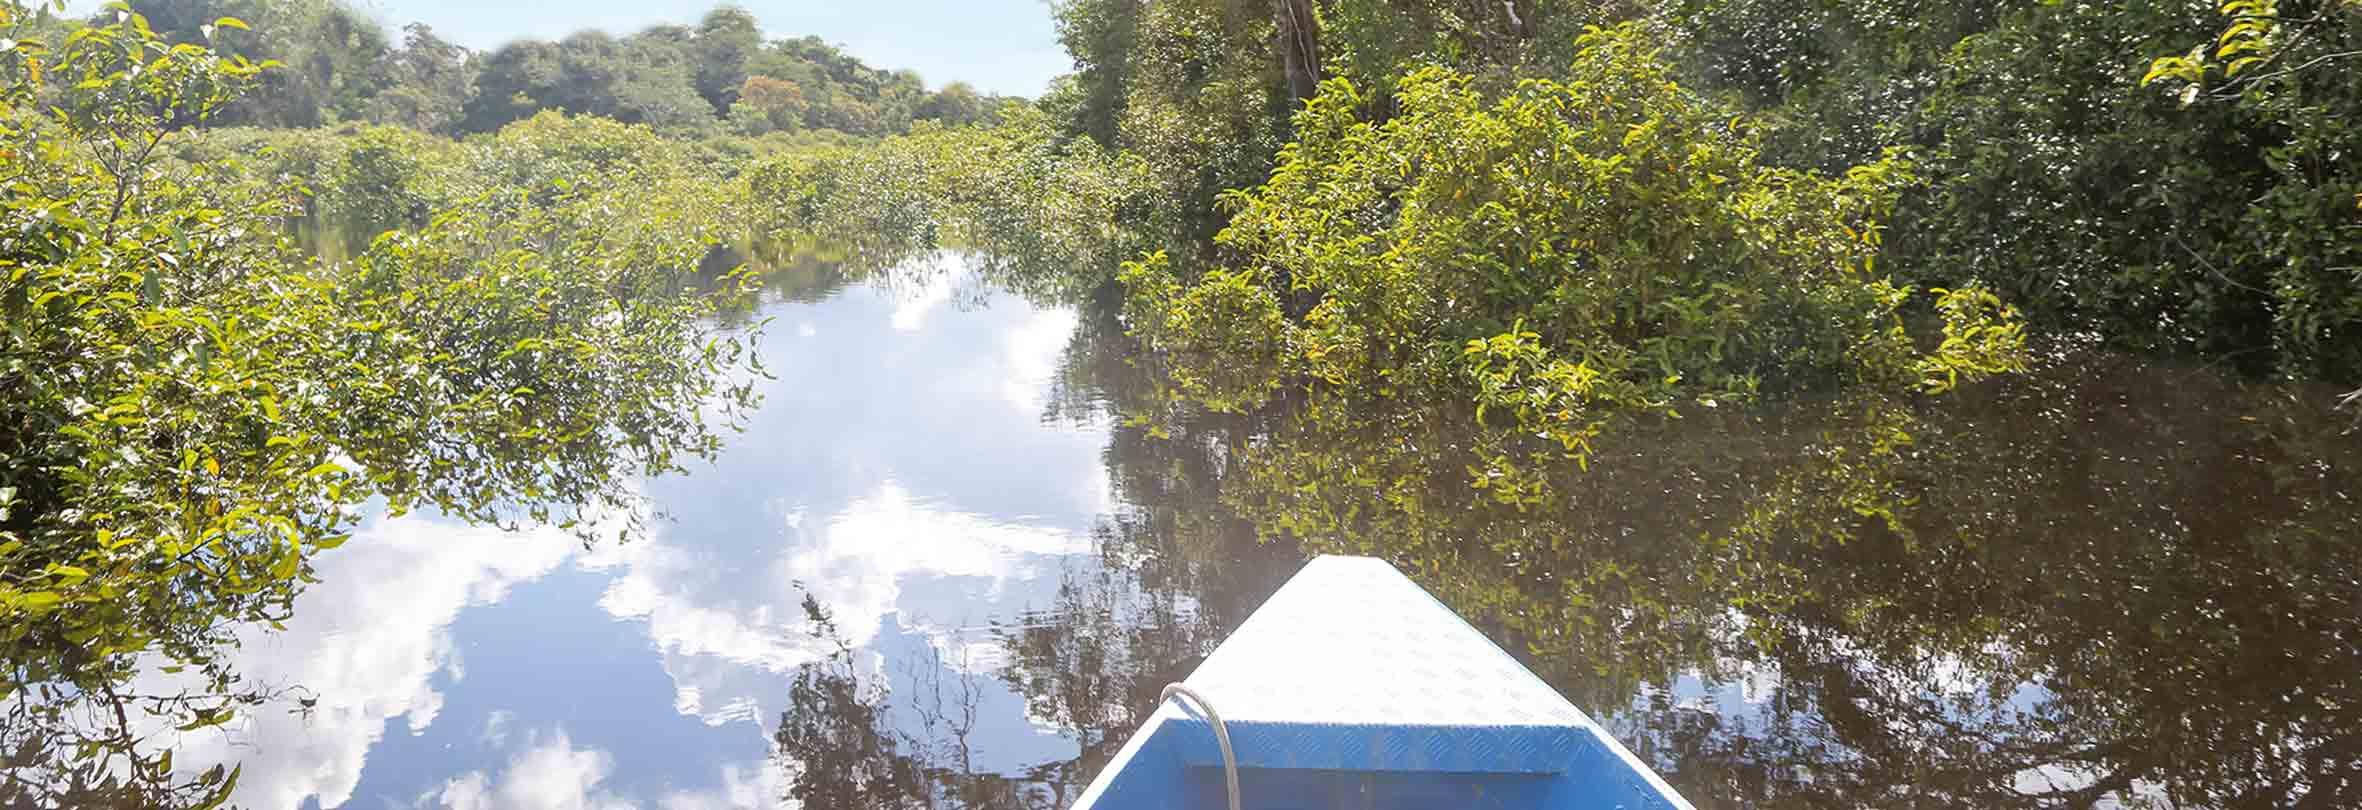 Per Boot durch den Amazonas, Peru